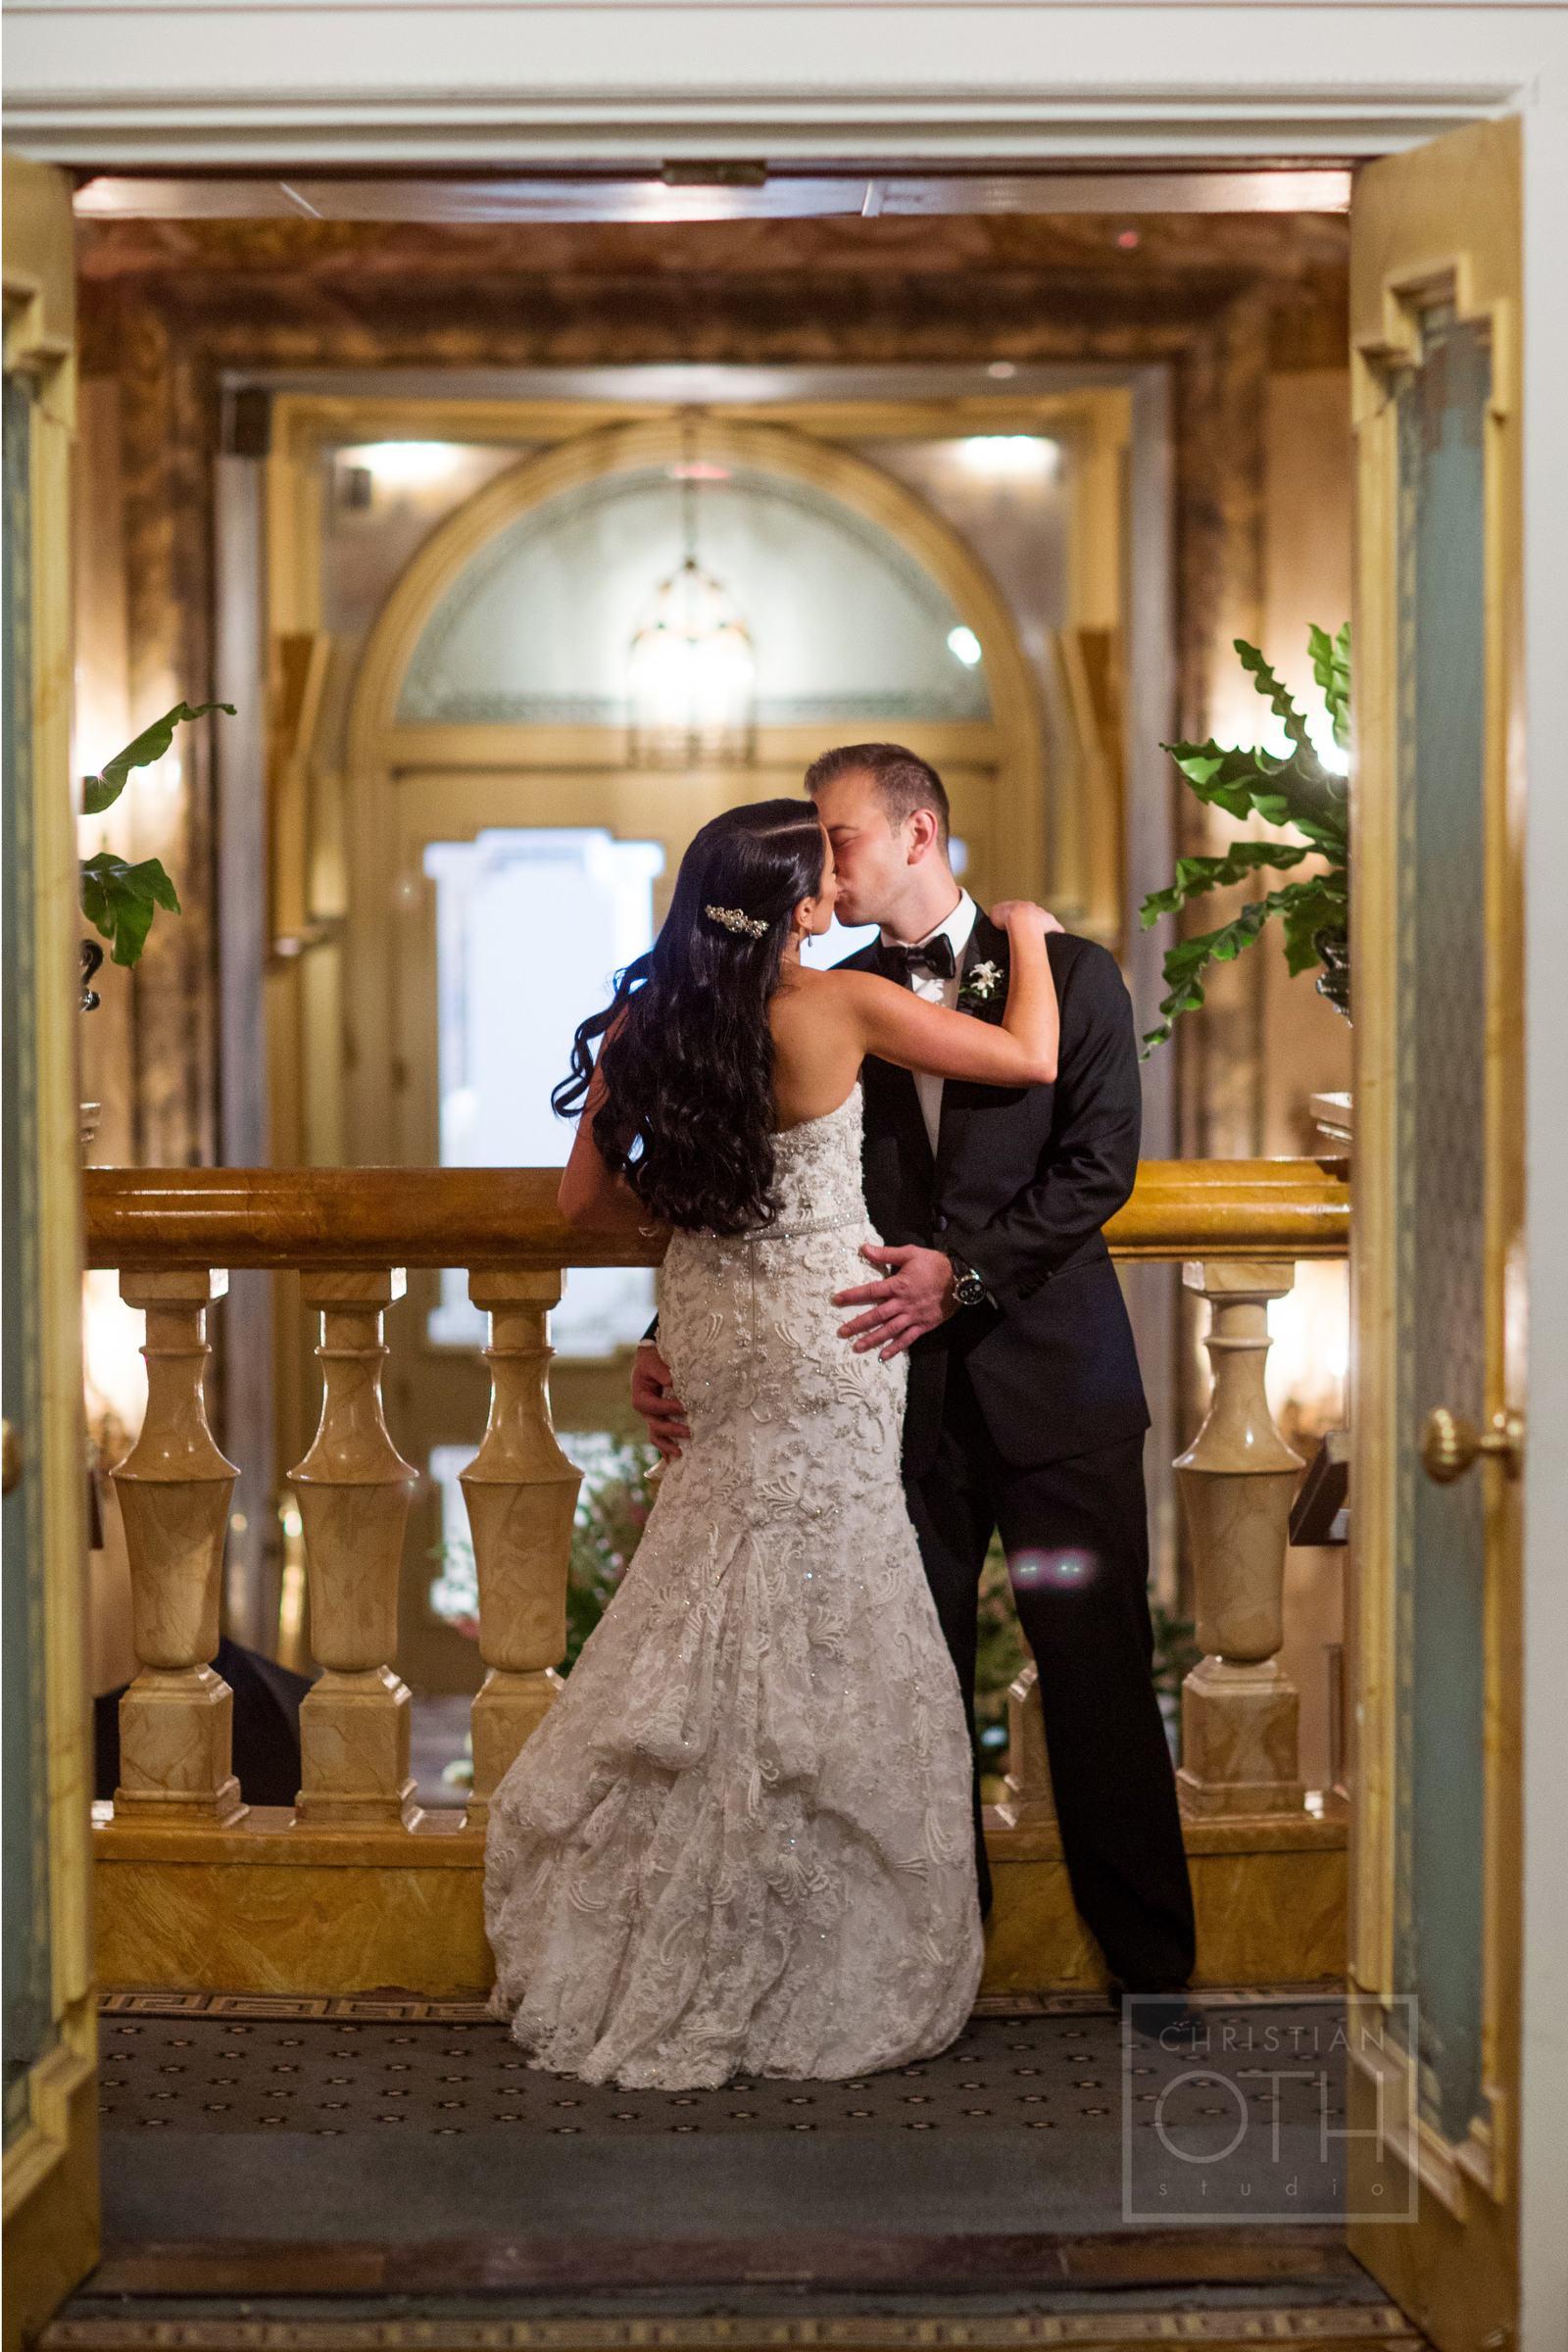 Ceci_New_York_Custom_Invitation_Pierre__City_ Destination_Wedding_Luxury_Personalized_Ceci_Style_Bride_Rose_Gold_Foil_Stamping50.JPG